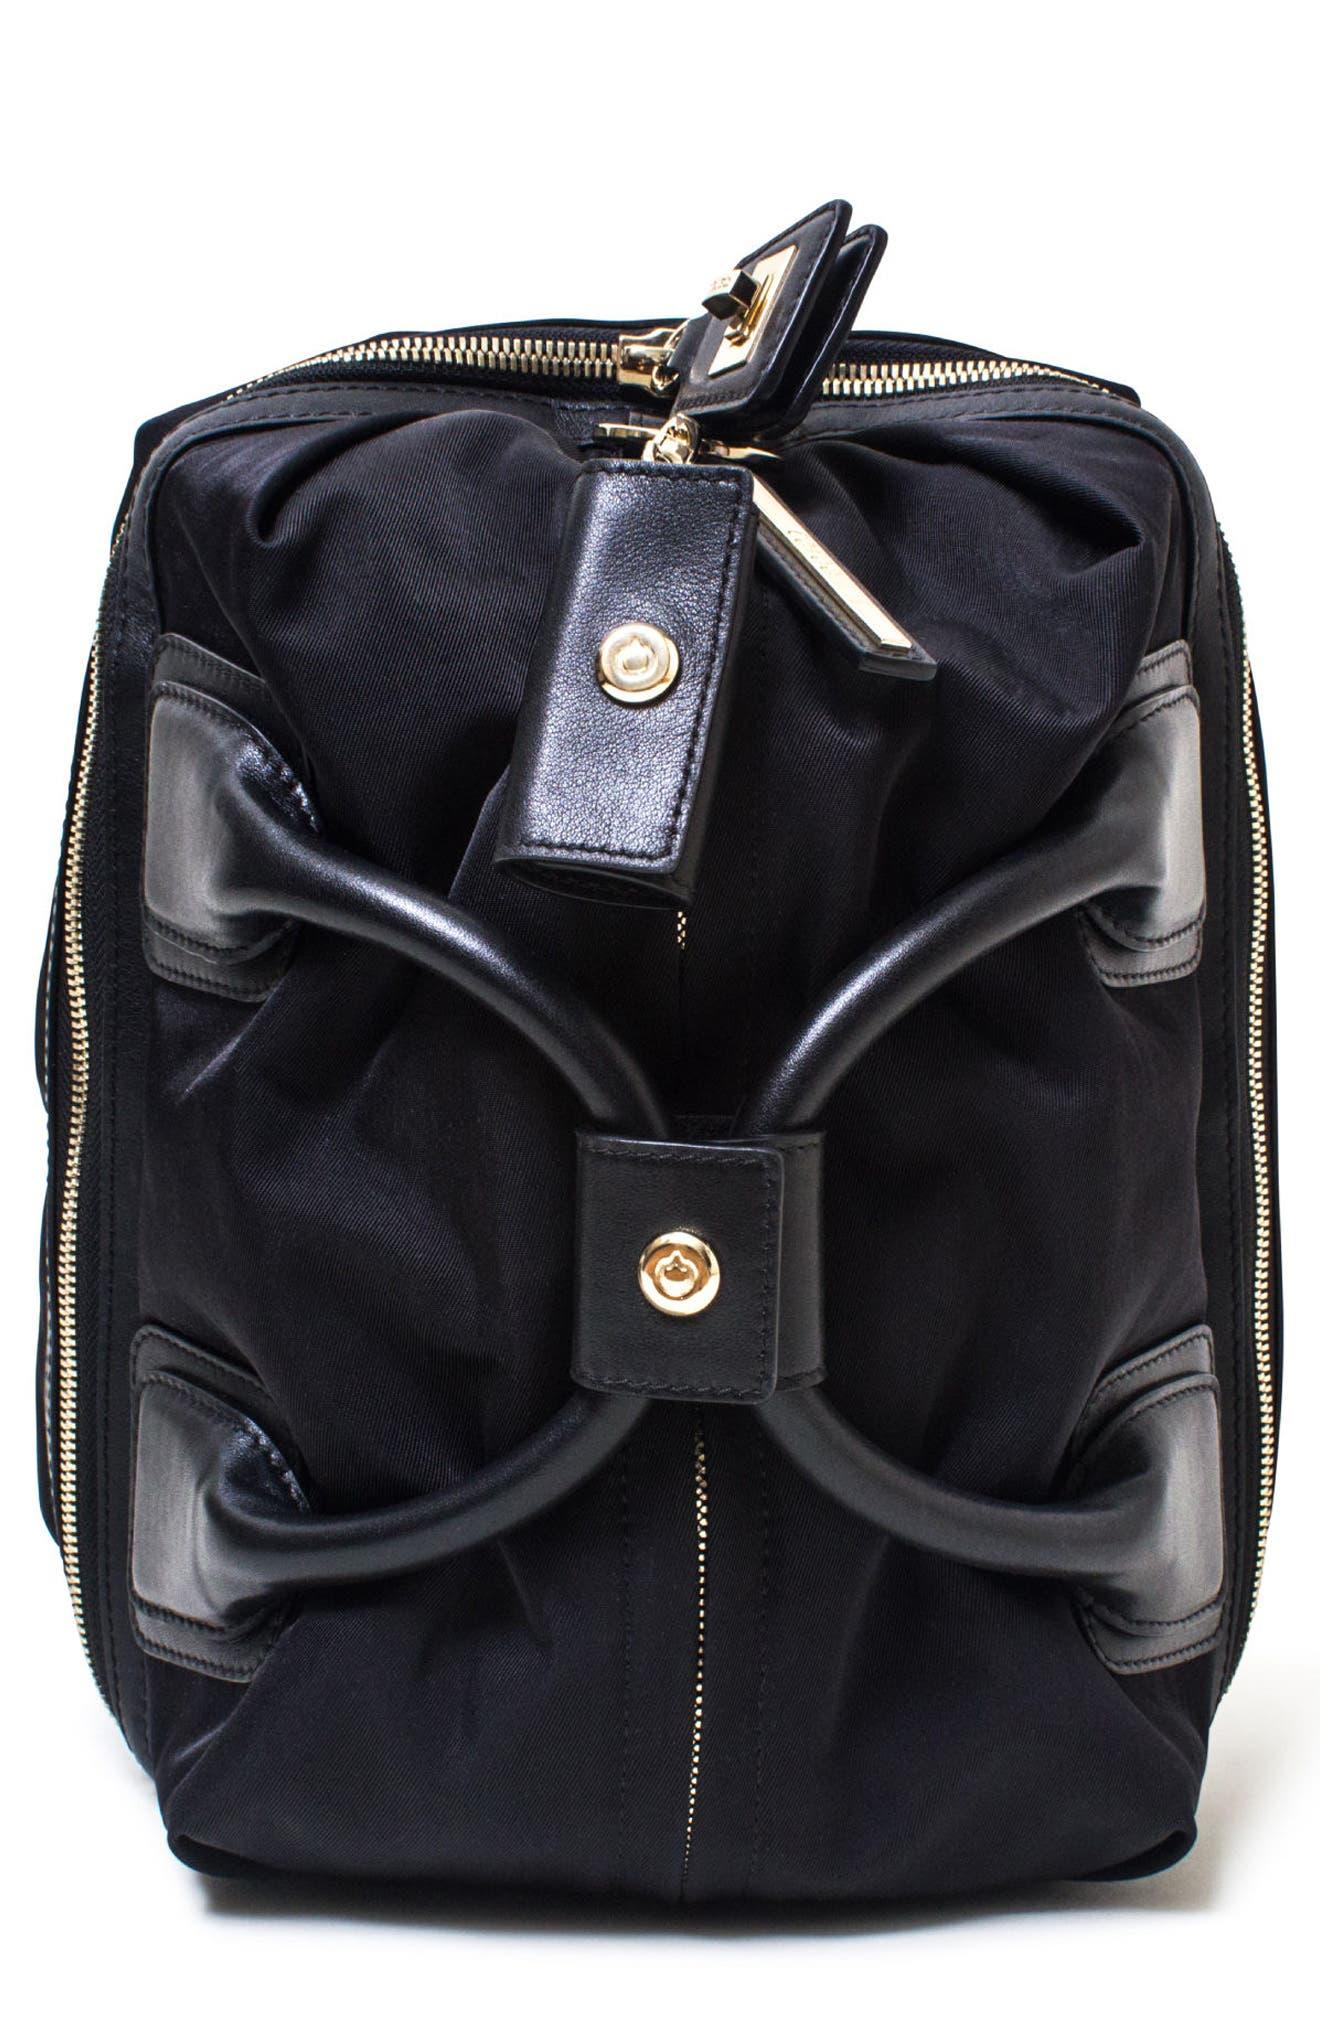 Studio Duffel Backpack,                             Main thumbnail 1, color,                             BLACK/ GOLD